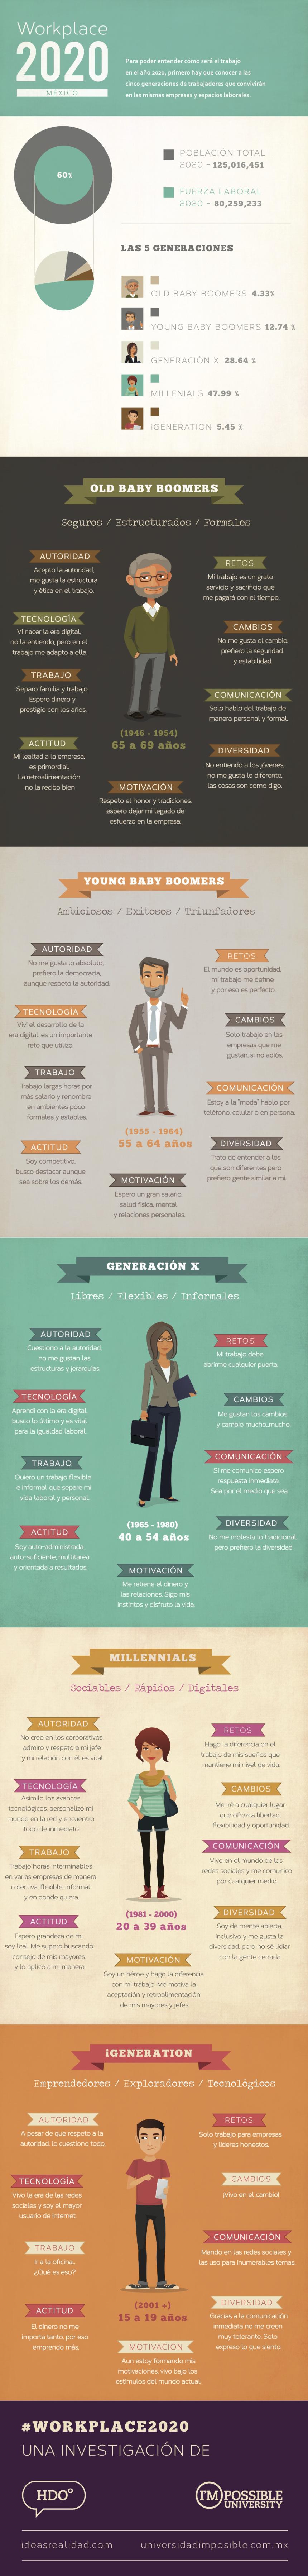 trabajo-mexico-2020-infografia